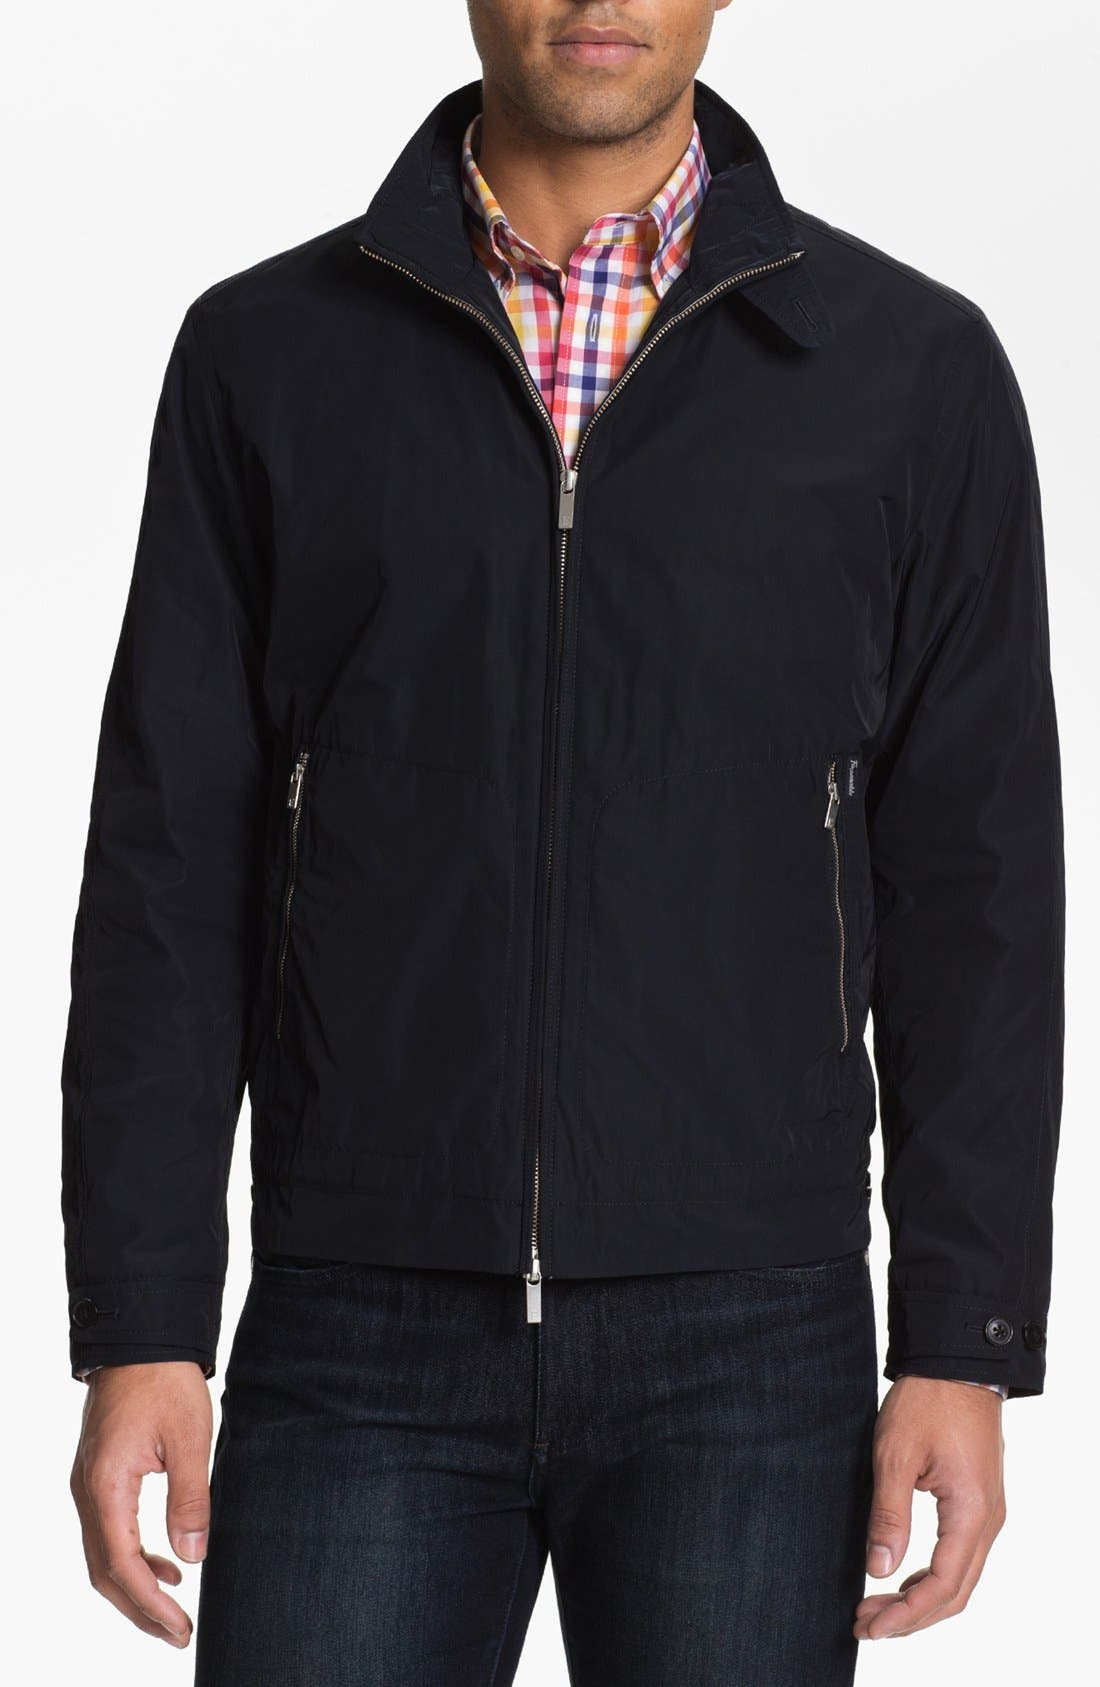 Main Image - Façonnable Open Bottom Jacket (Big & Tall)